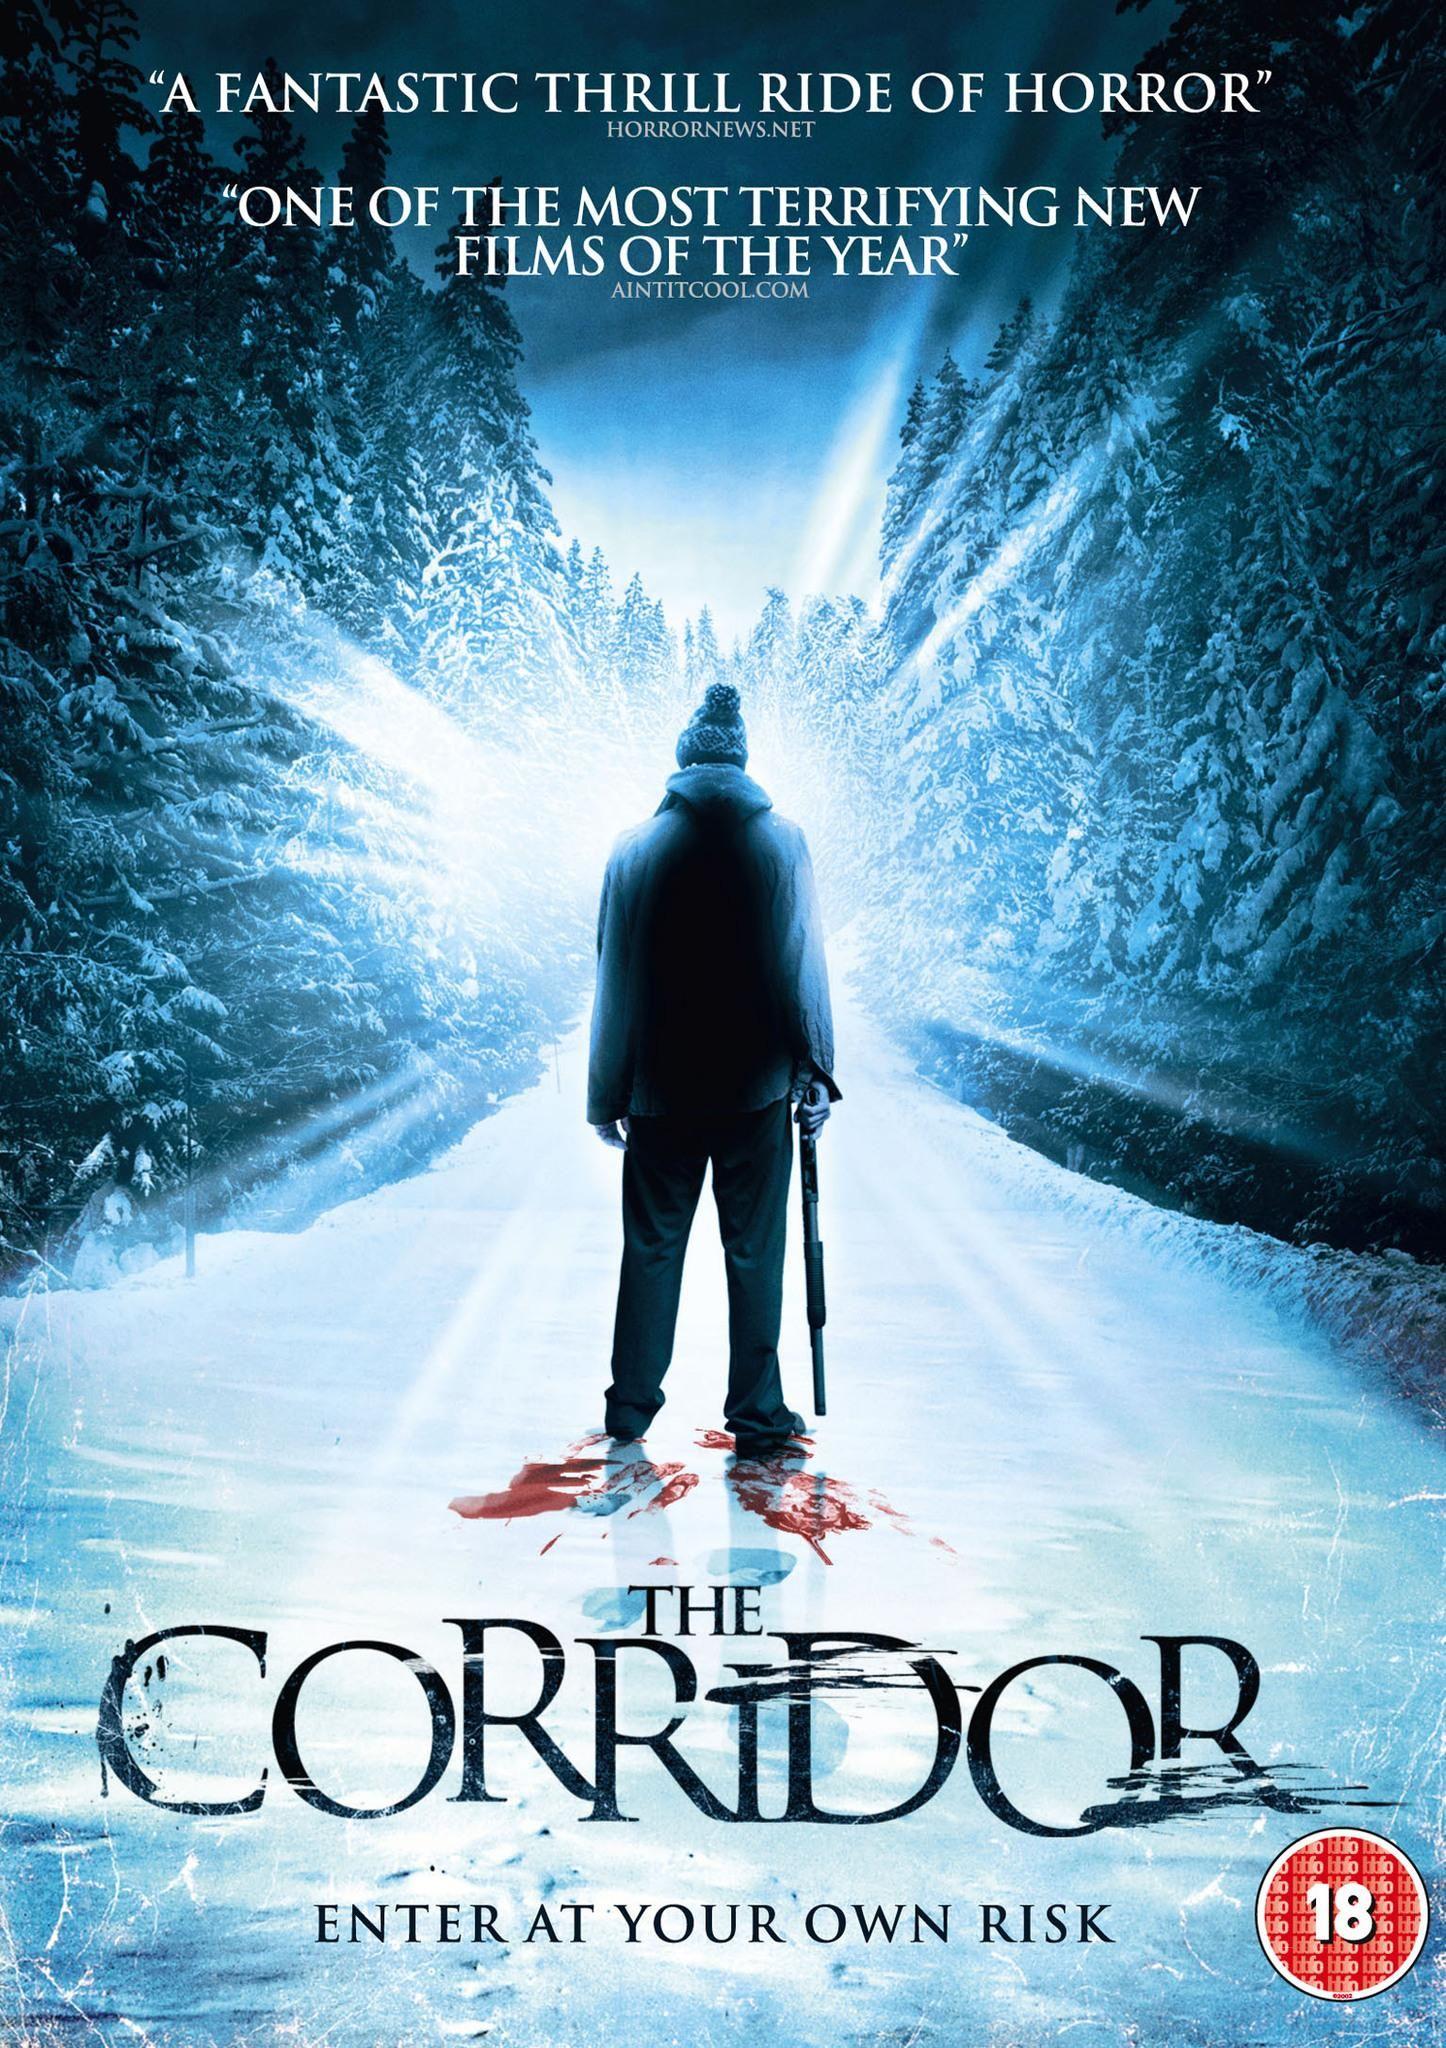 The Corridor 2010 Filmes De Terror Filmes Terror